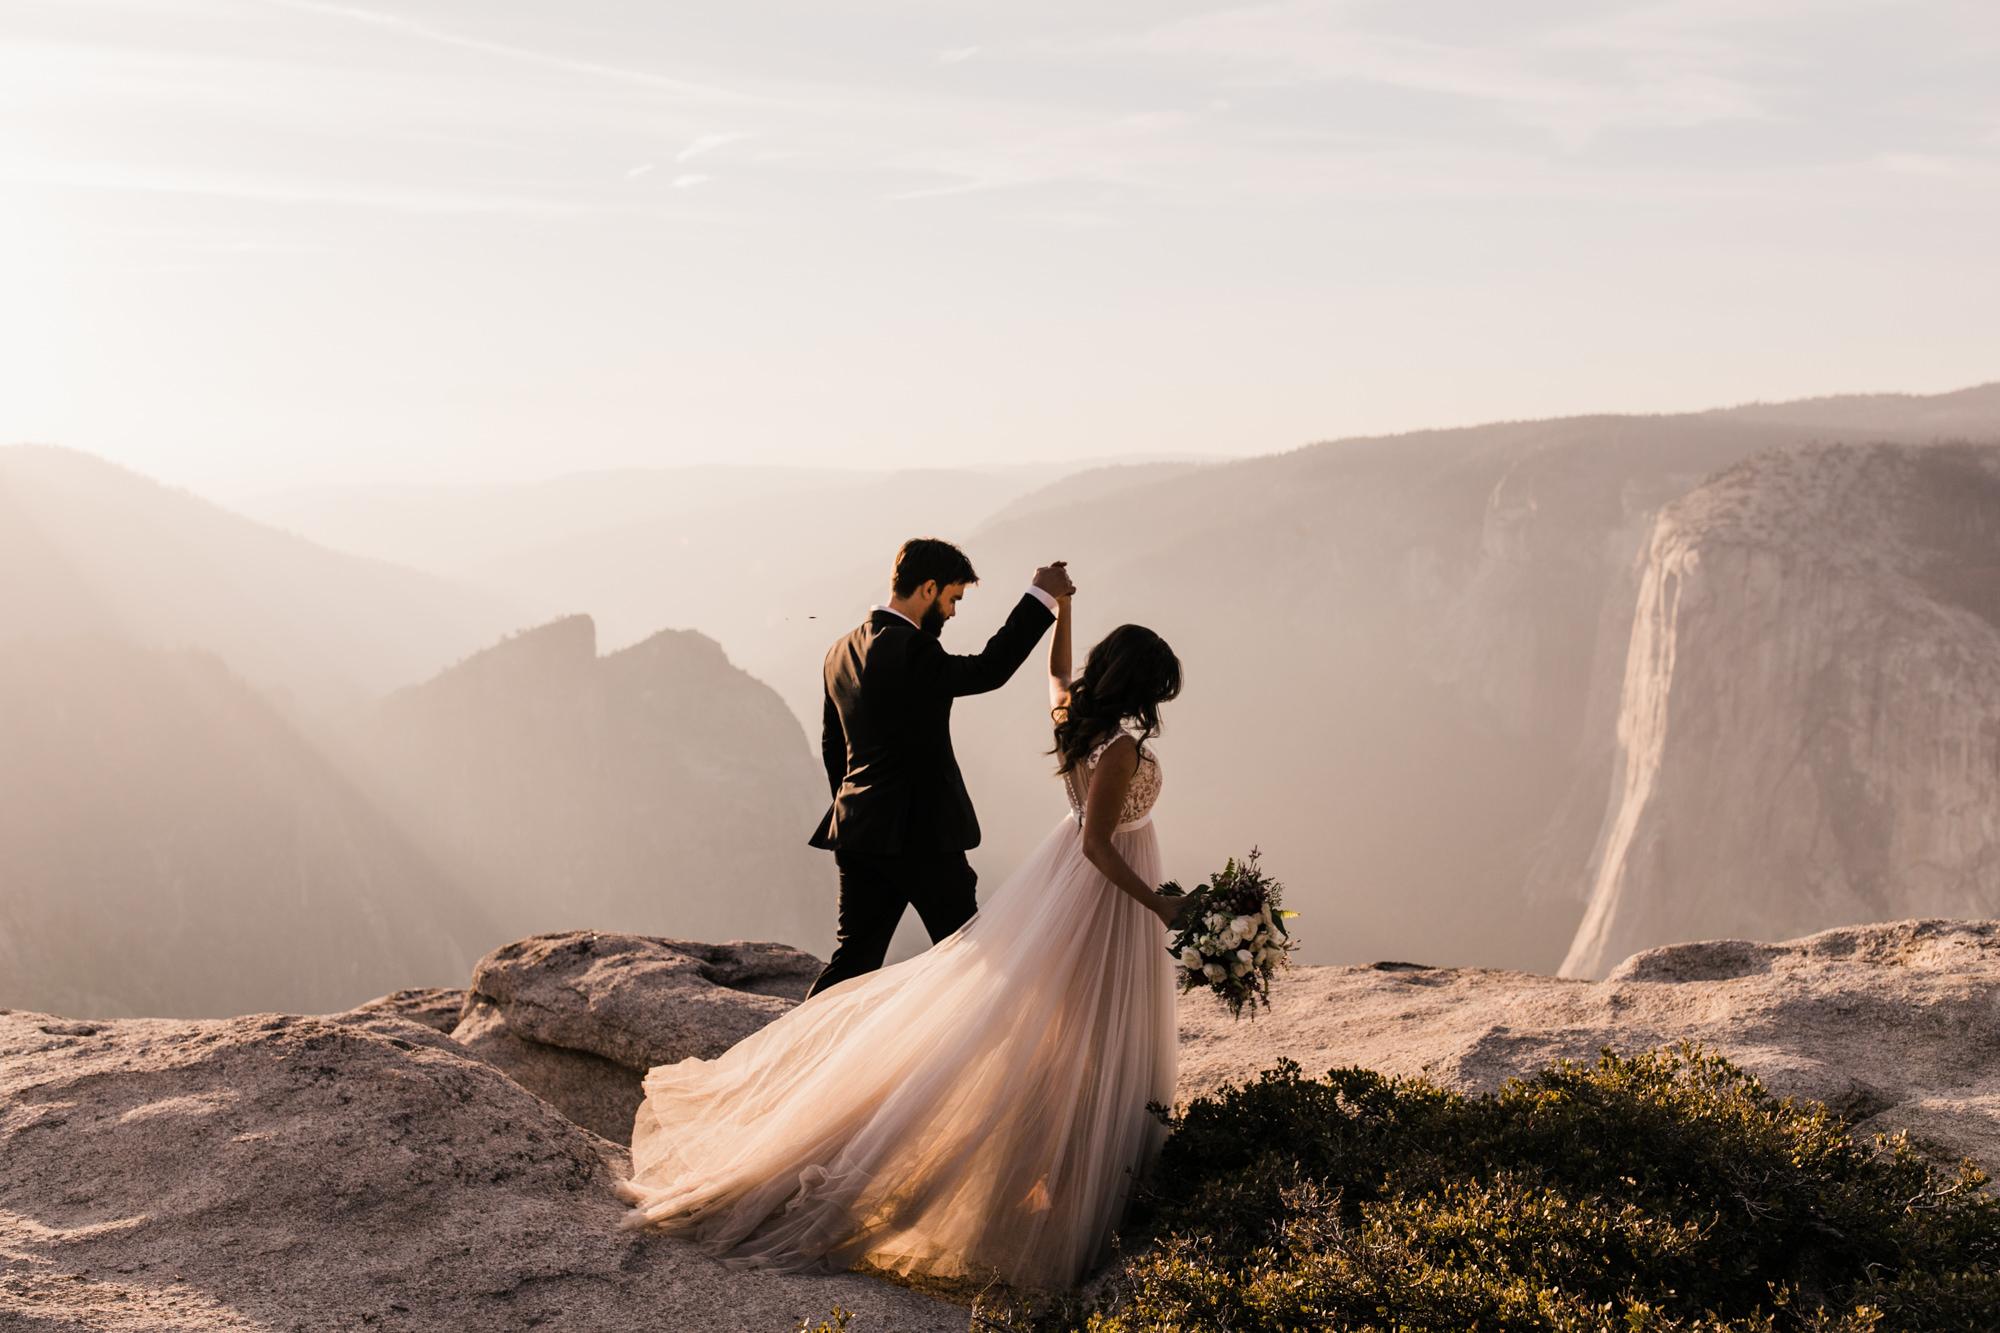 intimate adventurous elopement in yosemite national park | destination adventure wedding photographers | the hearnes adventure photography | www.thehearnes.com